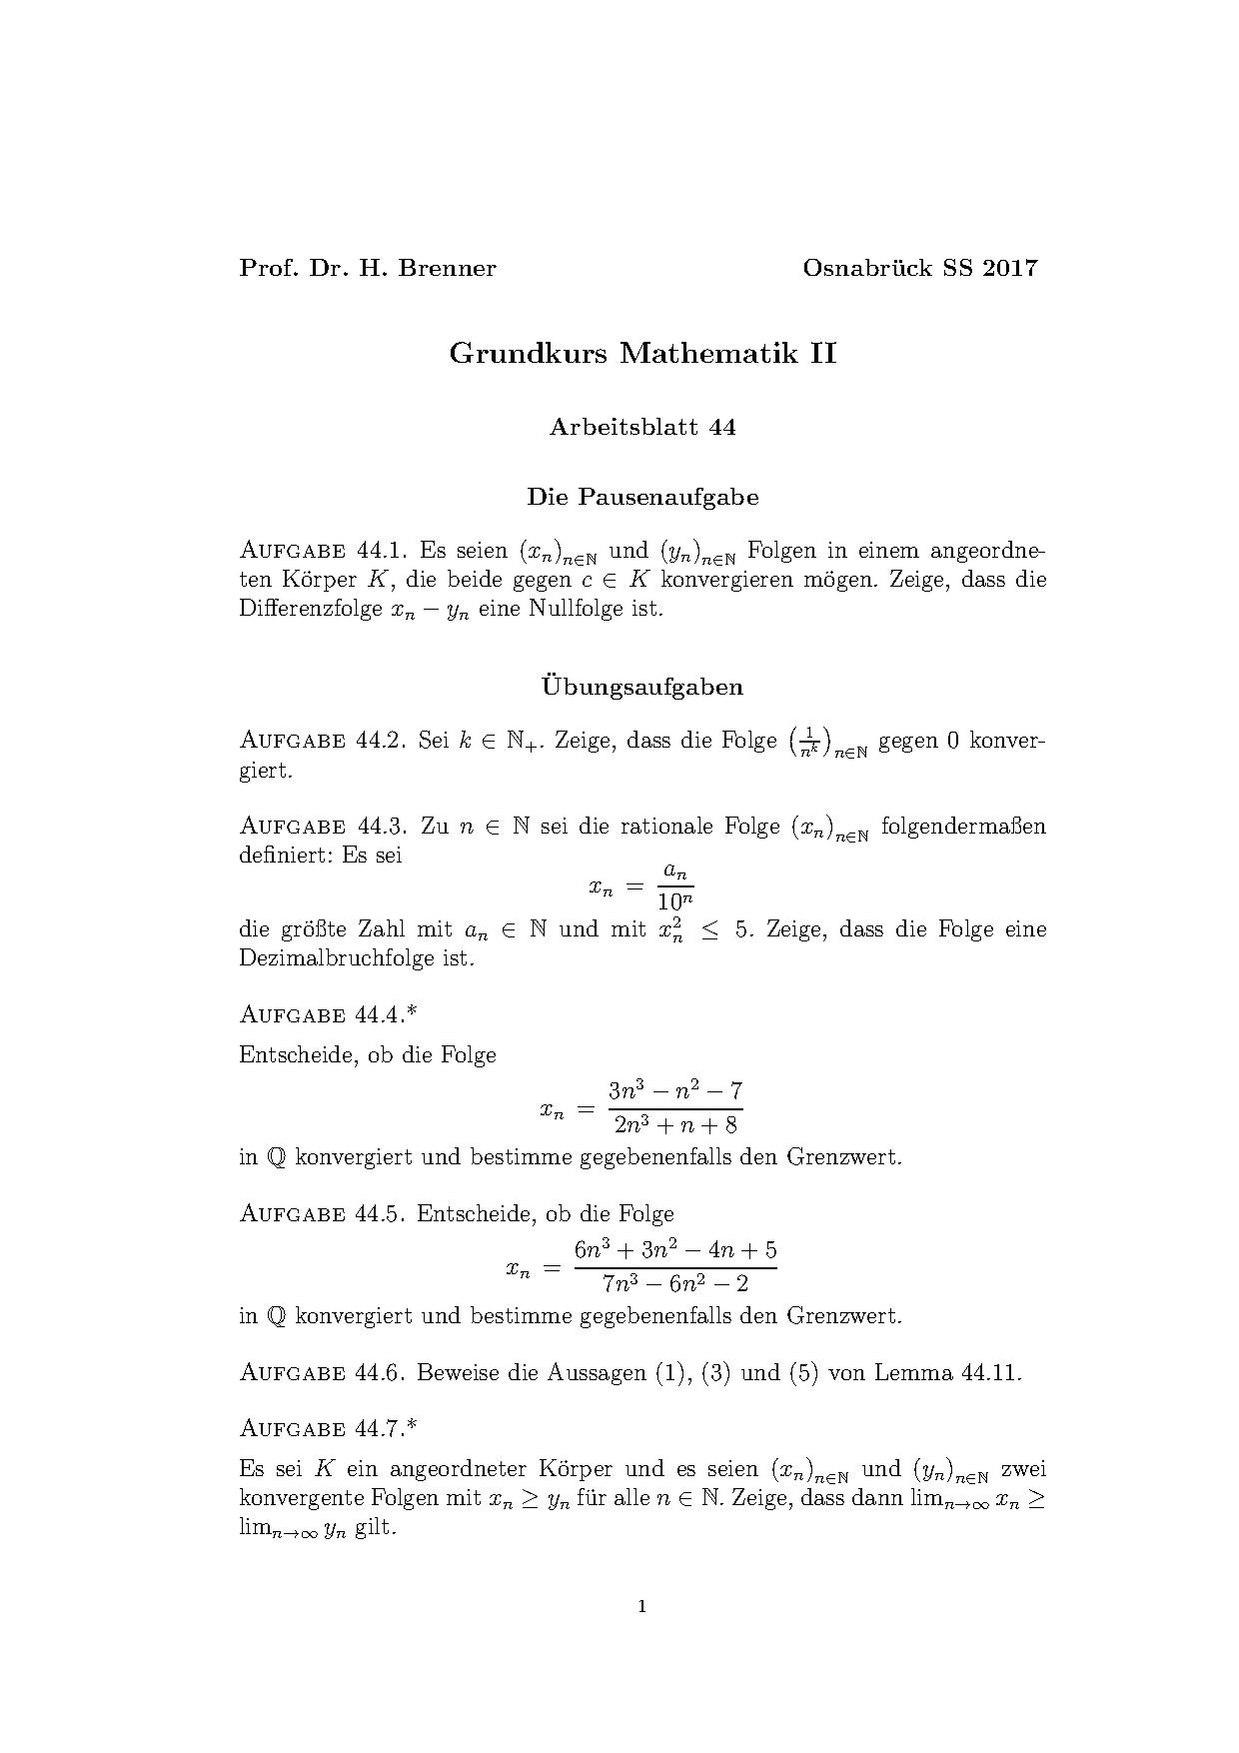 File:Grundkurs Mathematik (Osnabrück 2016-2017)Teil IIArbeitsblatt44 ...